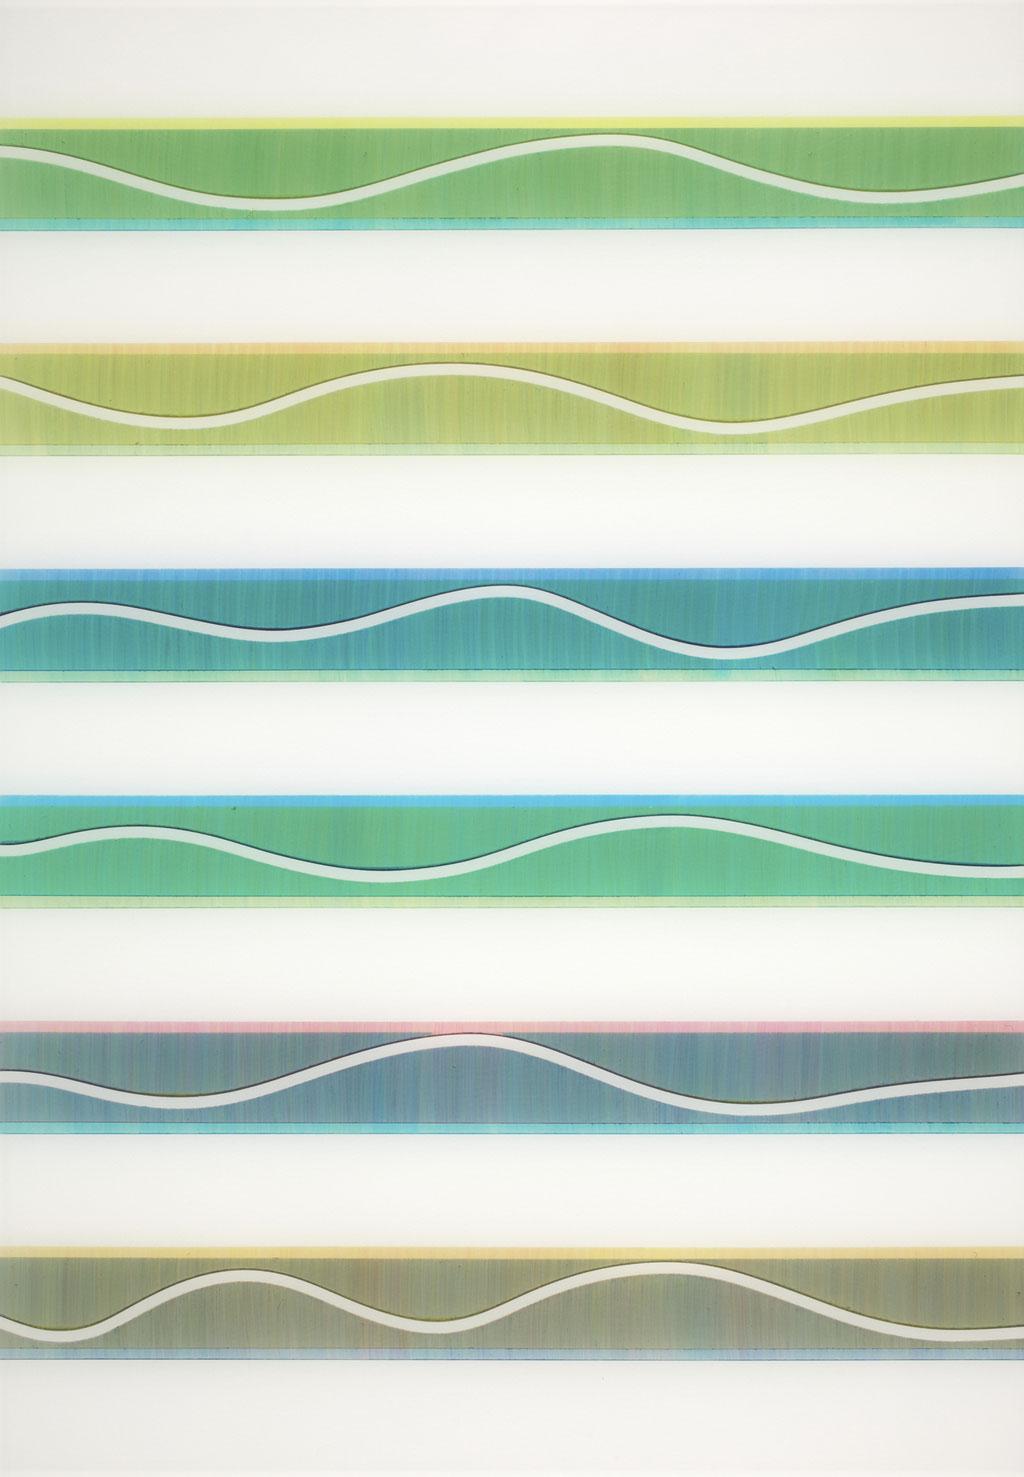 T.Wave:0001 - acrylic on acrylic sheet - 66 x 46 cm